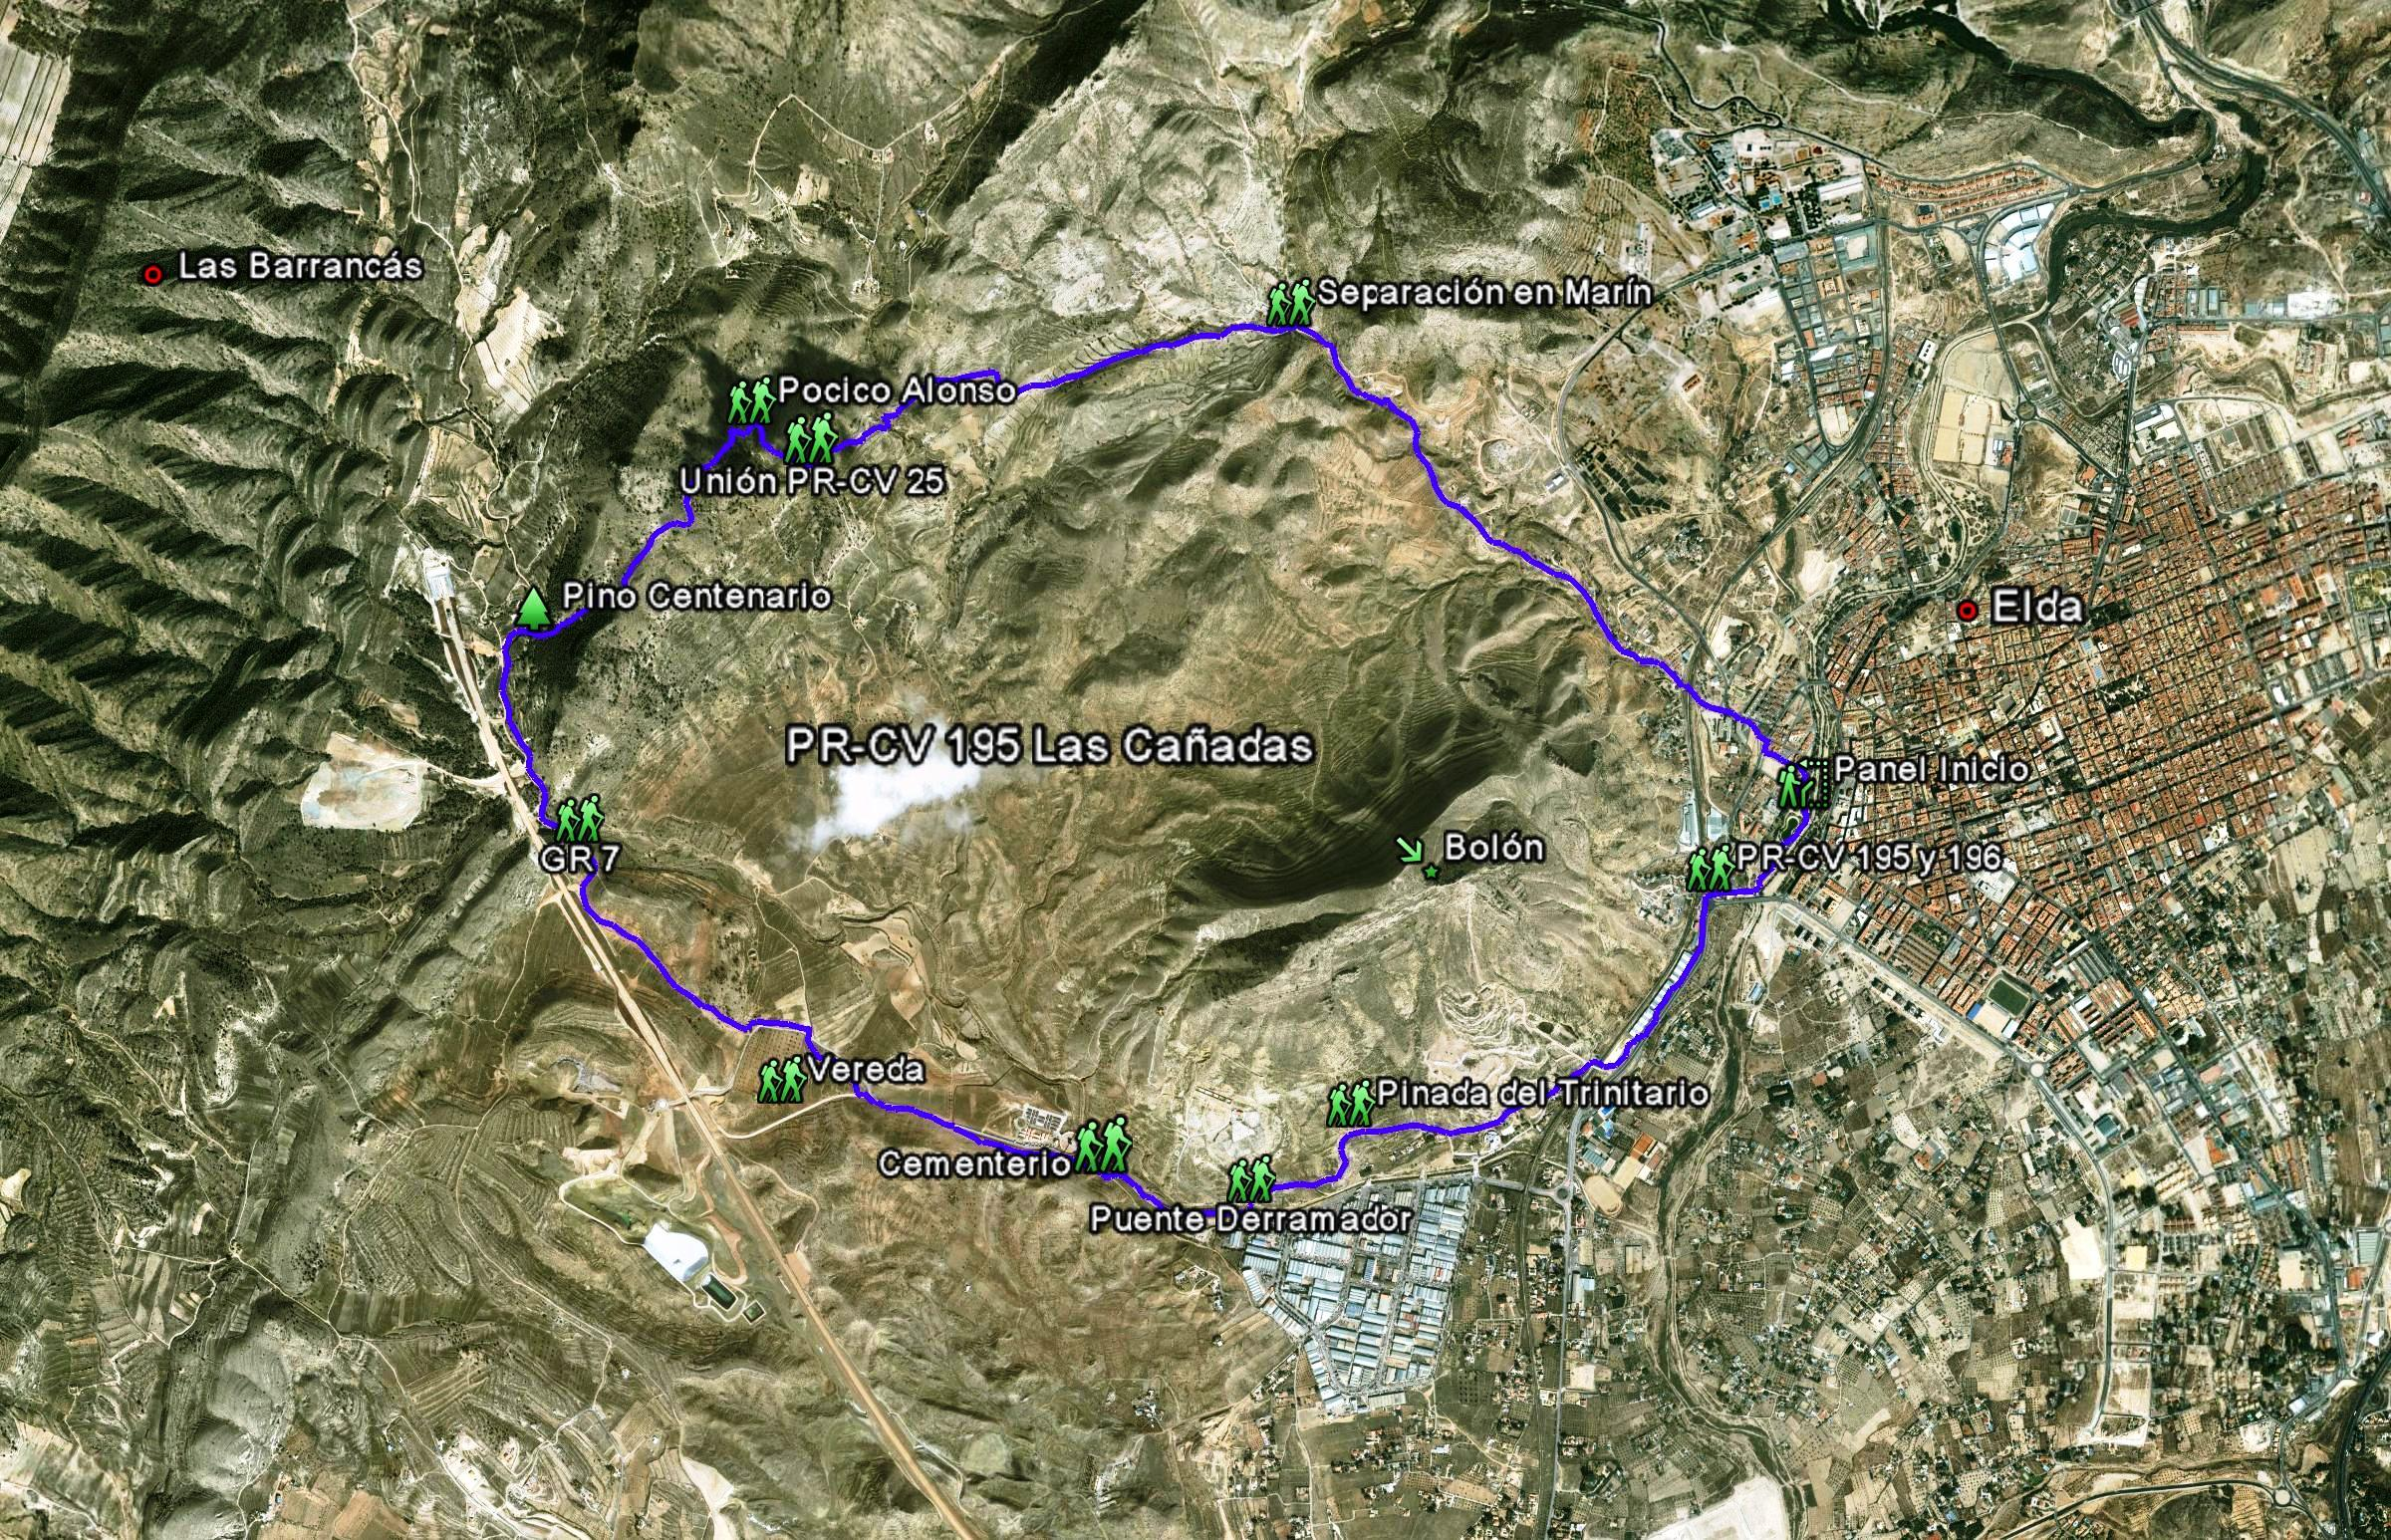 Mapa PR-CR 195 Las Cañadas